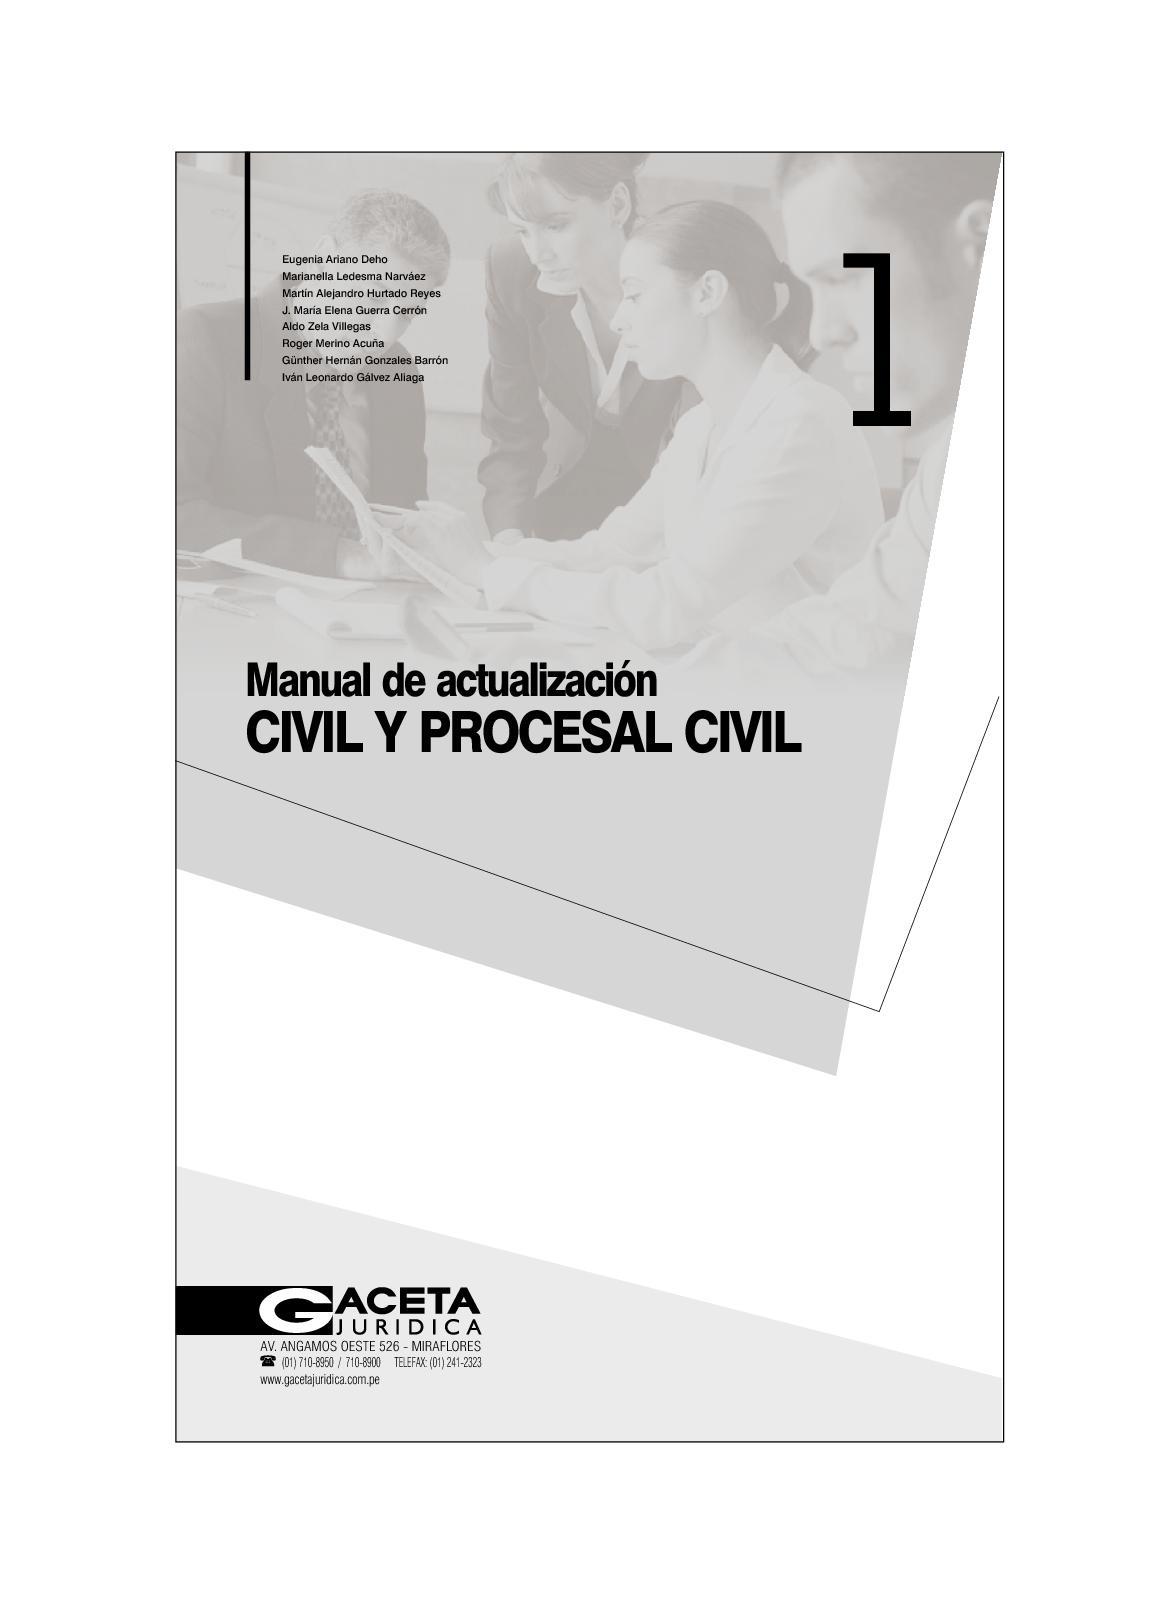 Calaméo - Teoria Manu Actualiza Civil Y Pro Civil Gaceta Jurica